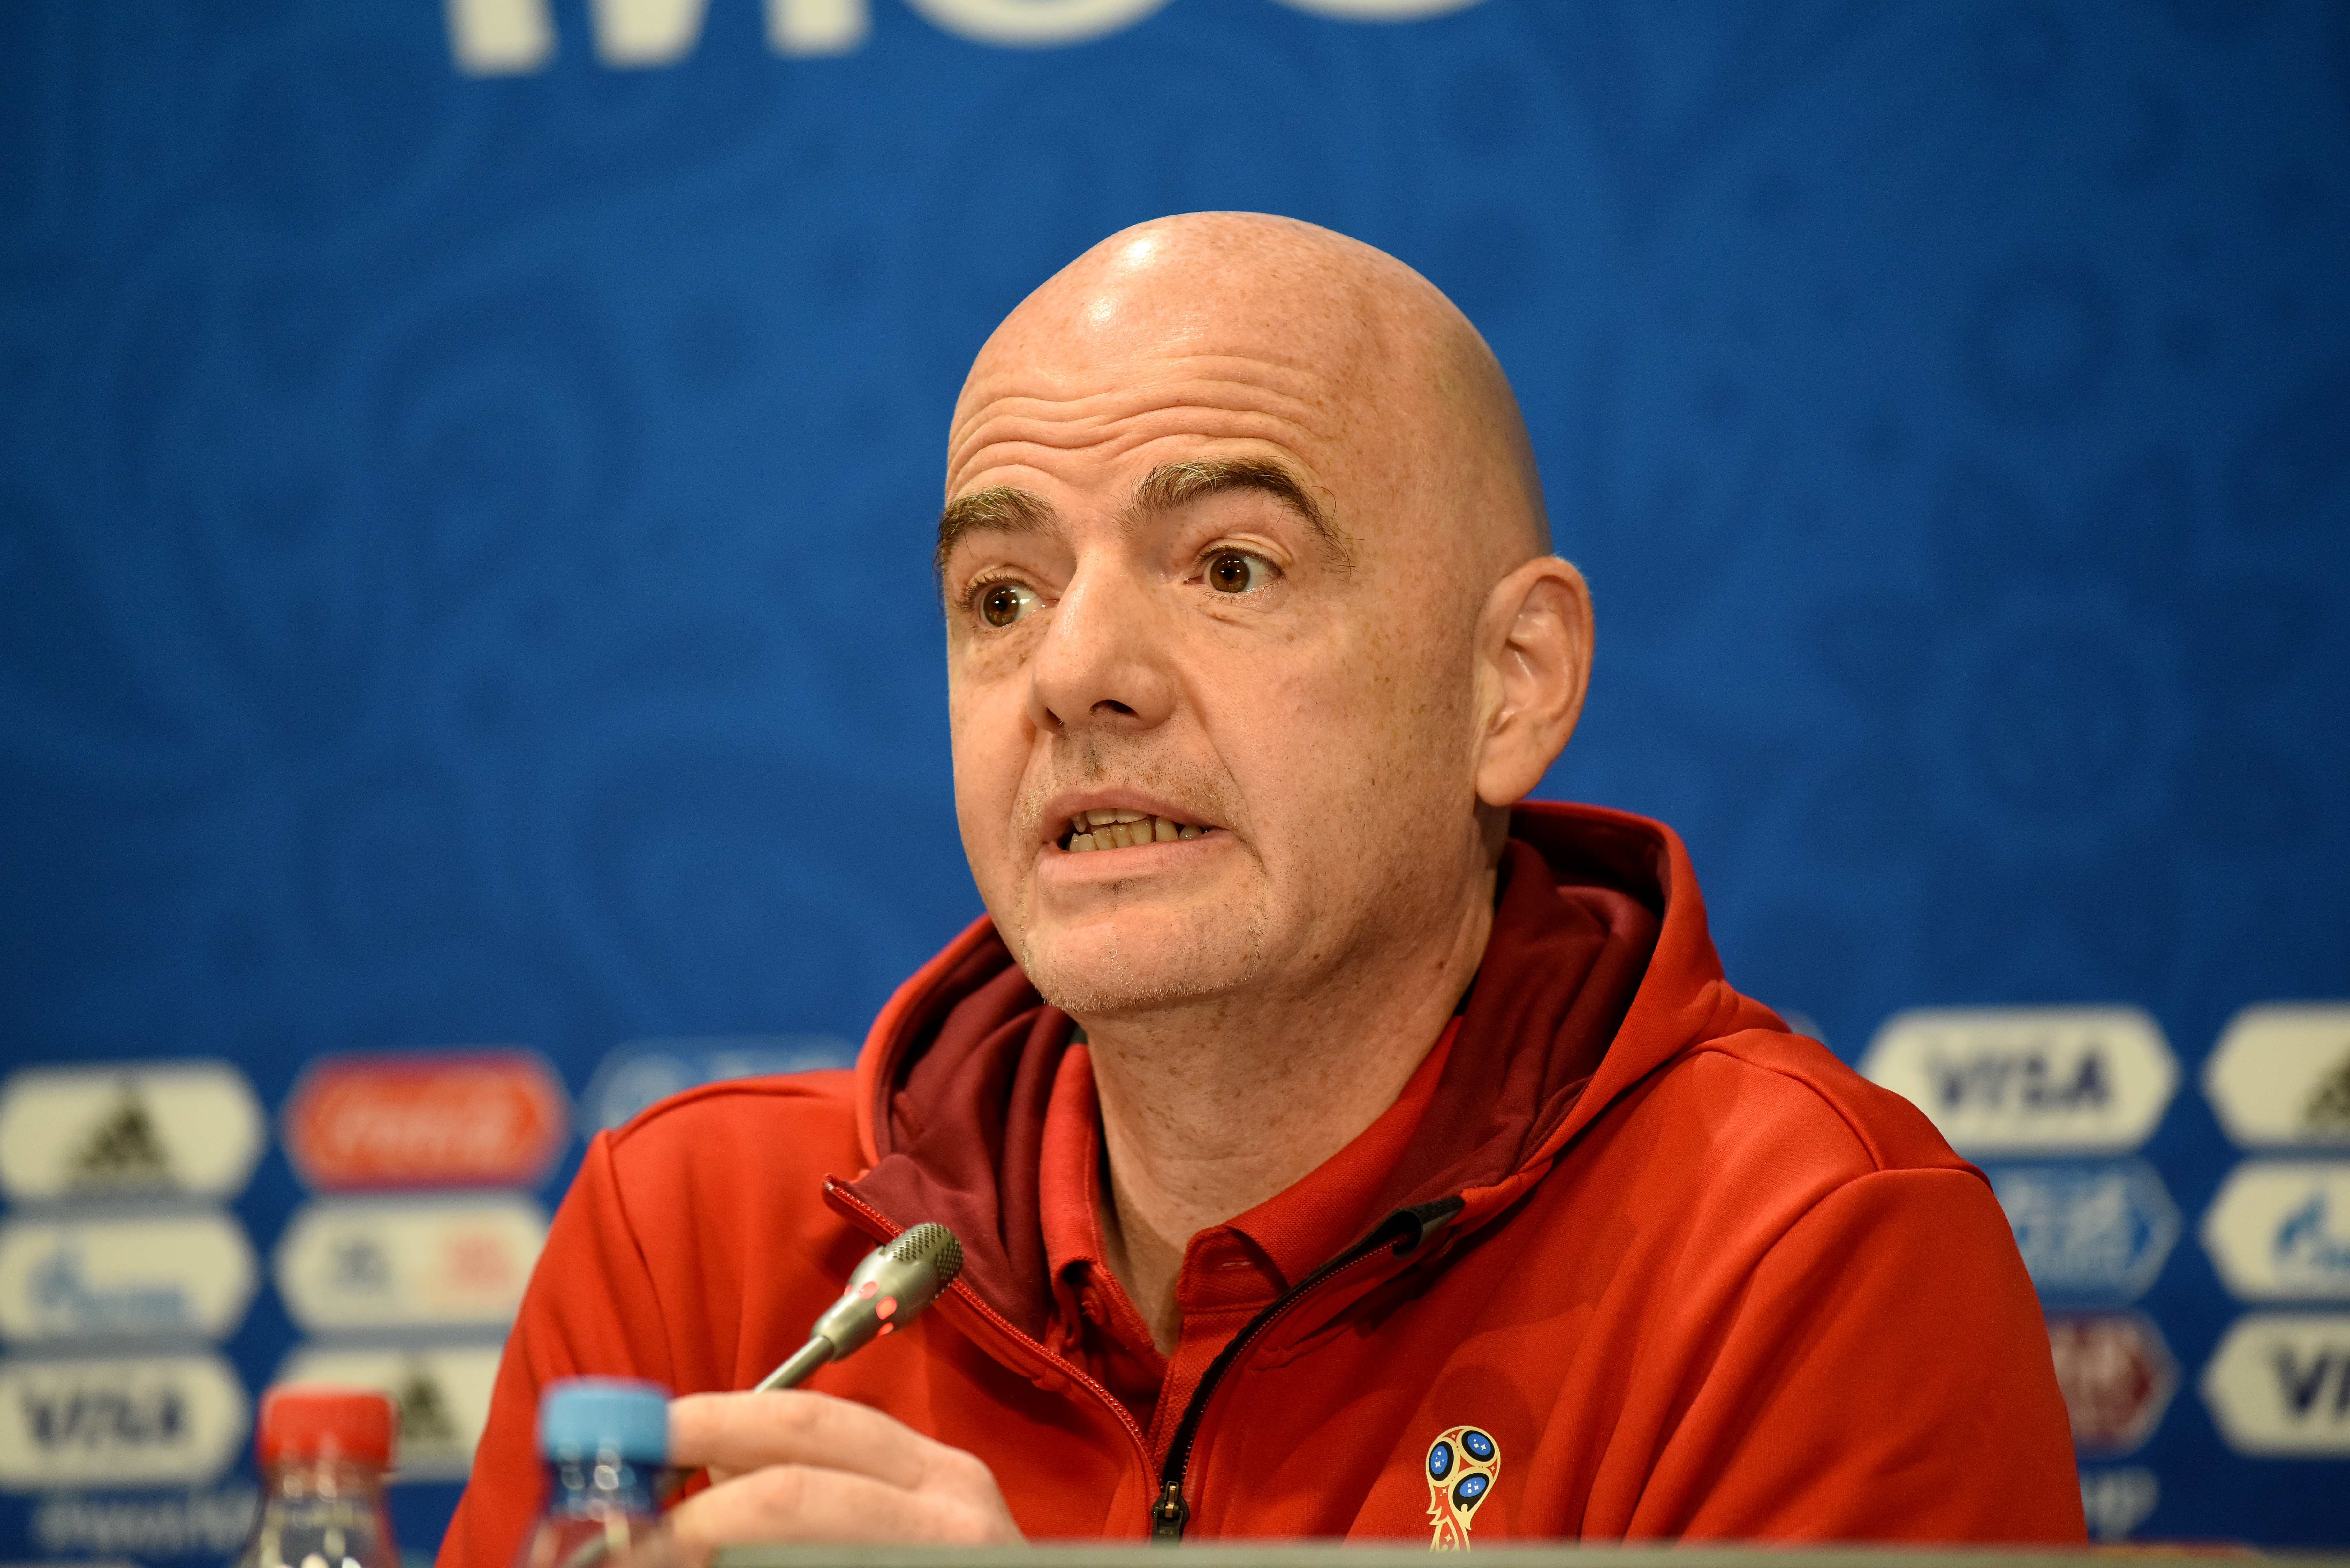 Gianni Infantino, Qatar World Cup